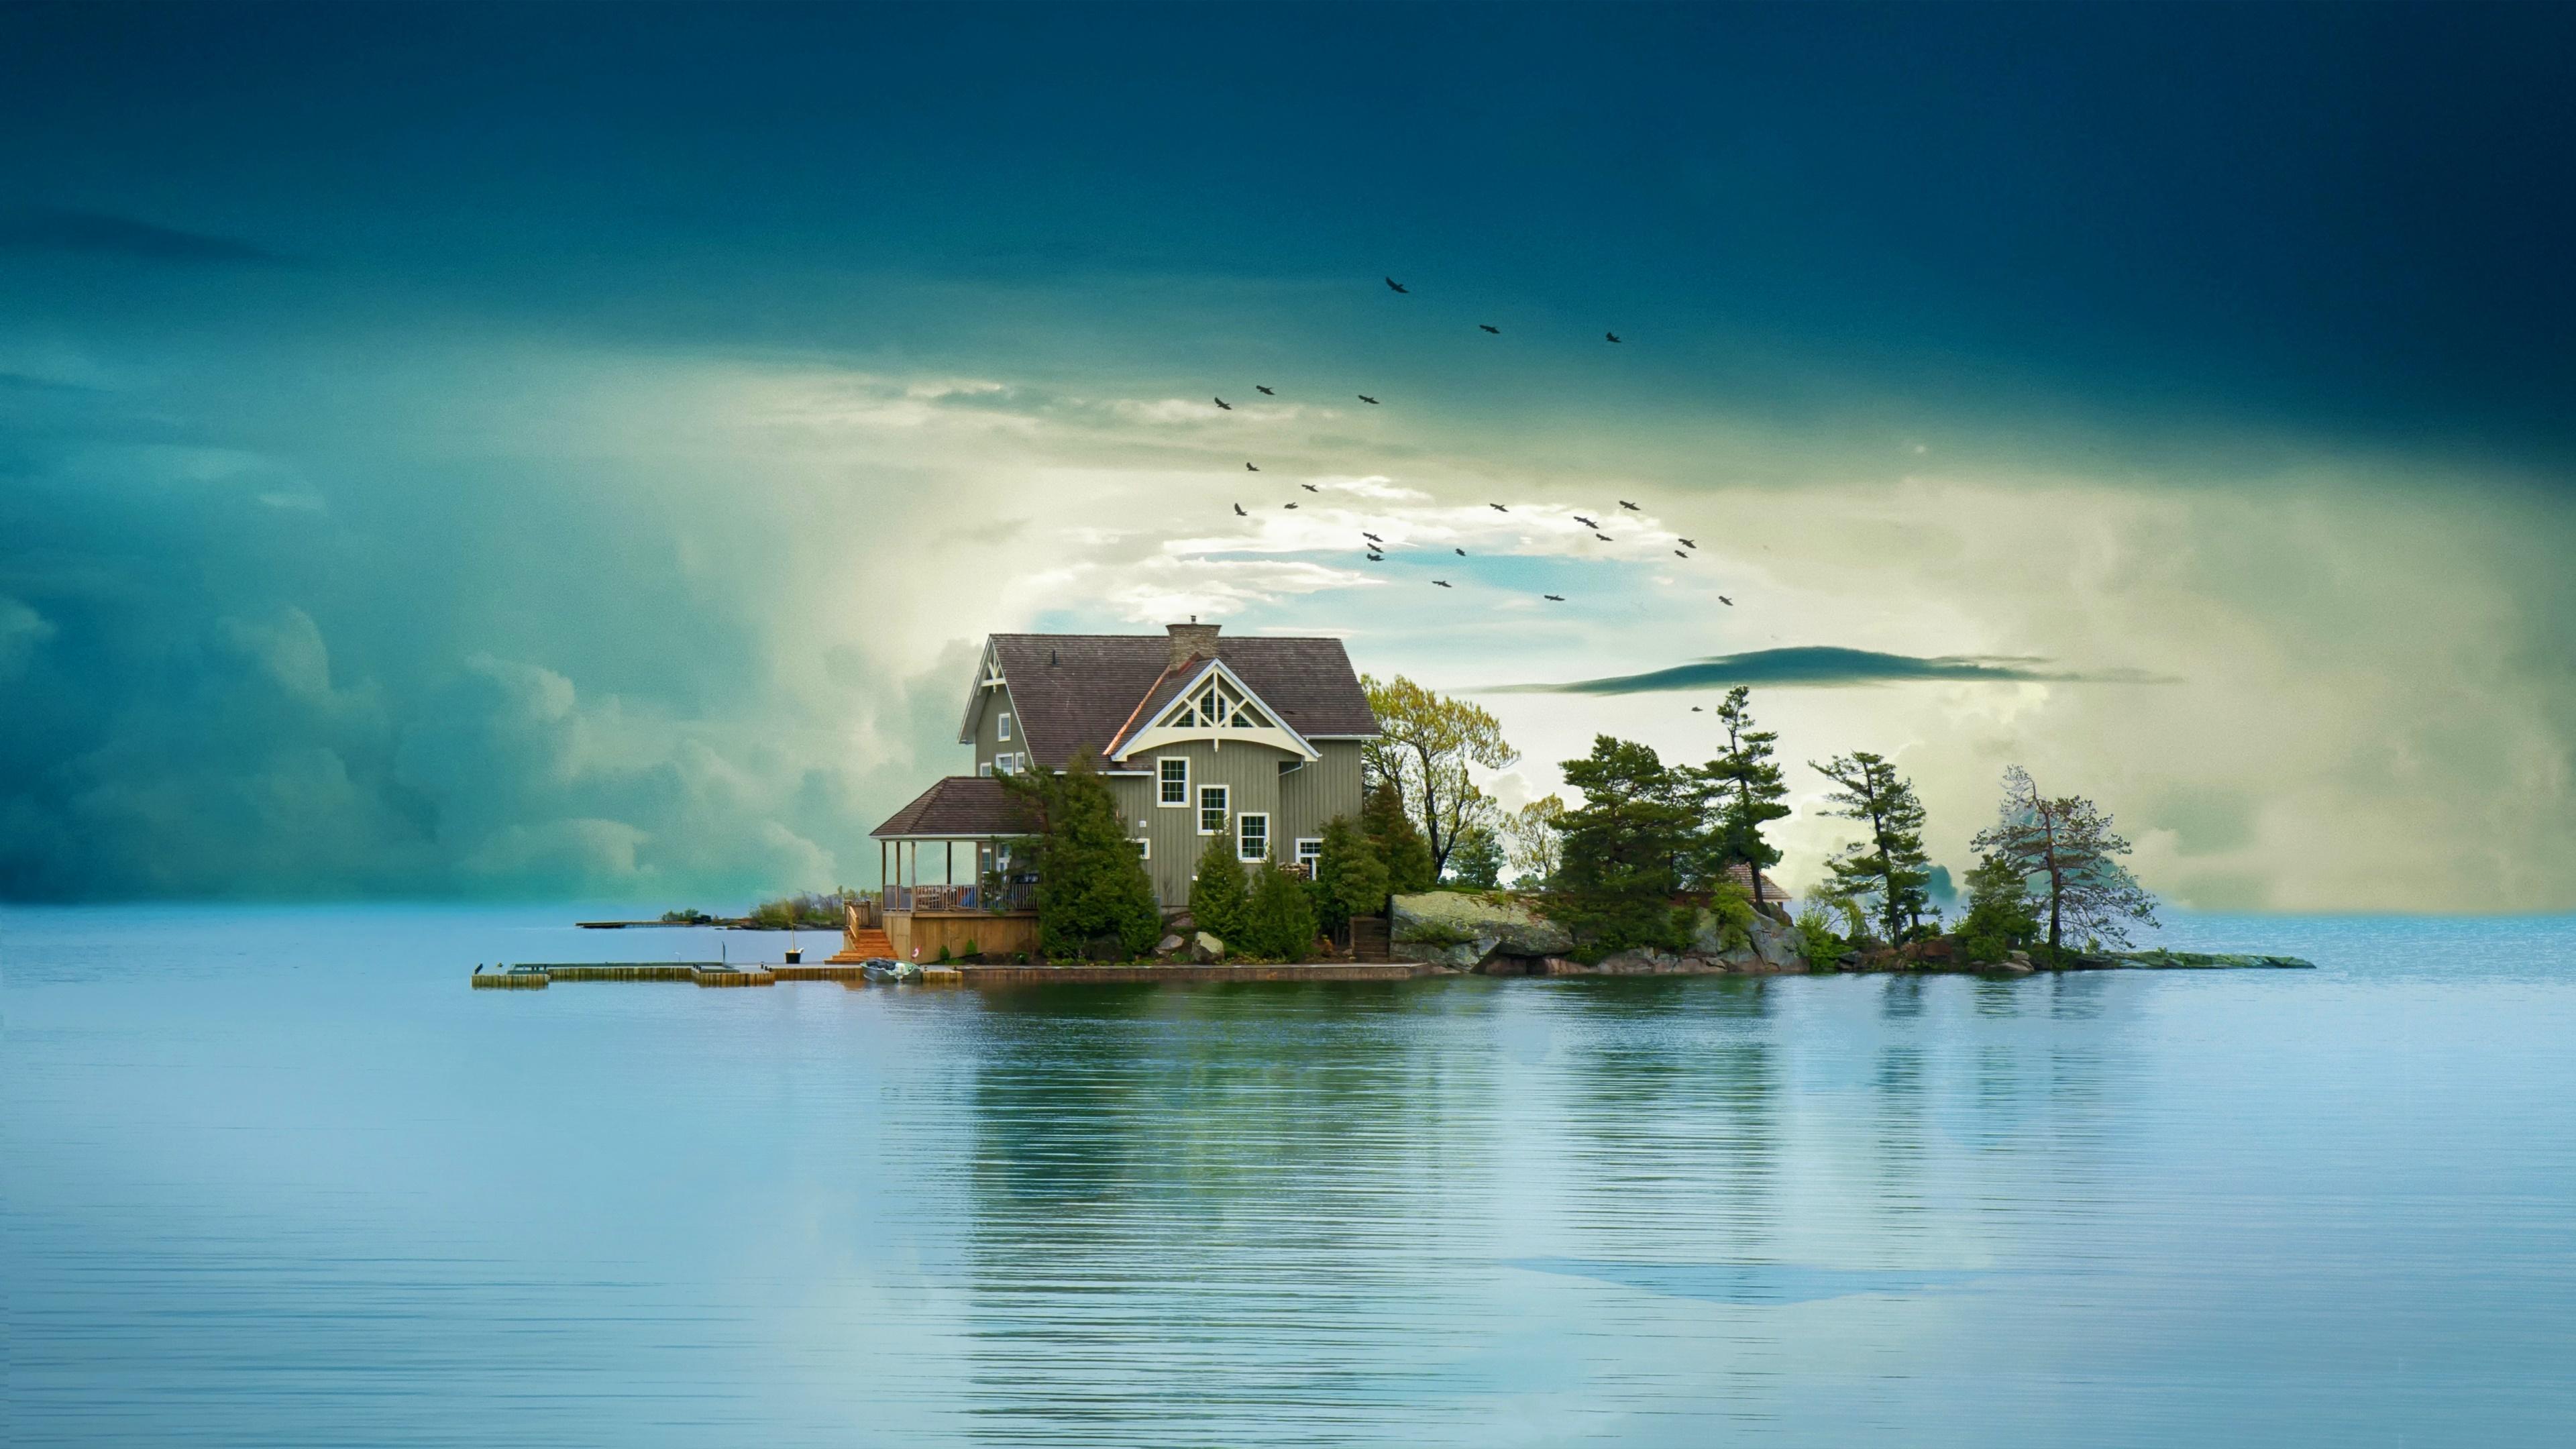 House On Small Island 4k Ultra Fondo De Pantalla Hd Fondo